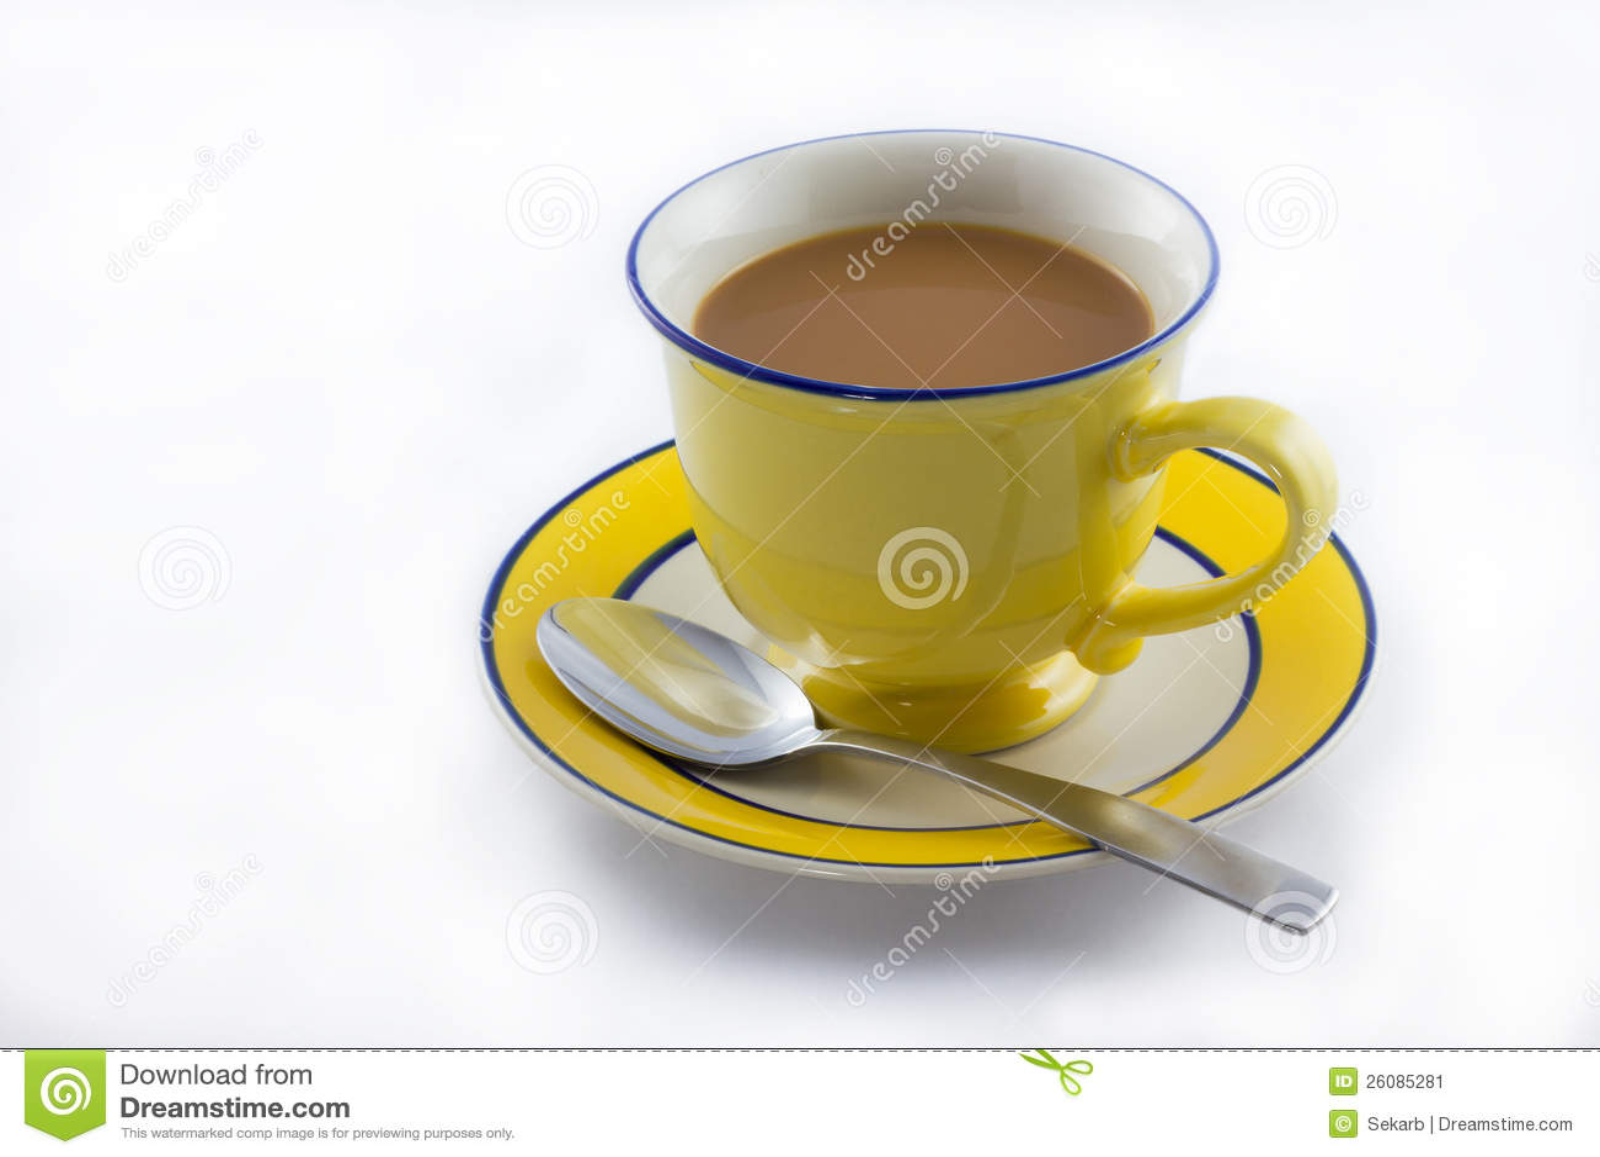 Cup Of Milk Tea Stock Image - Image: 26085281